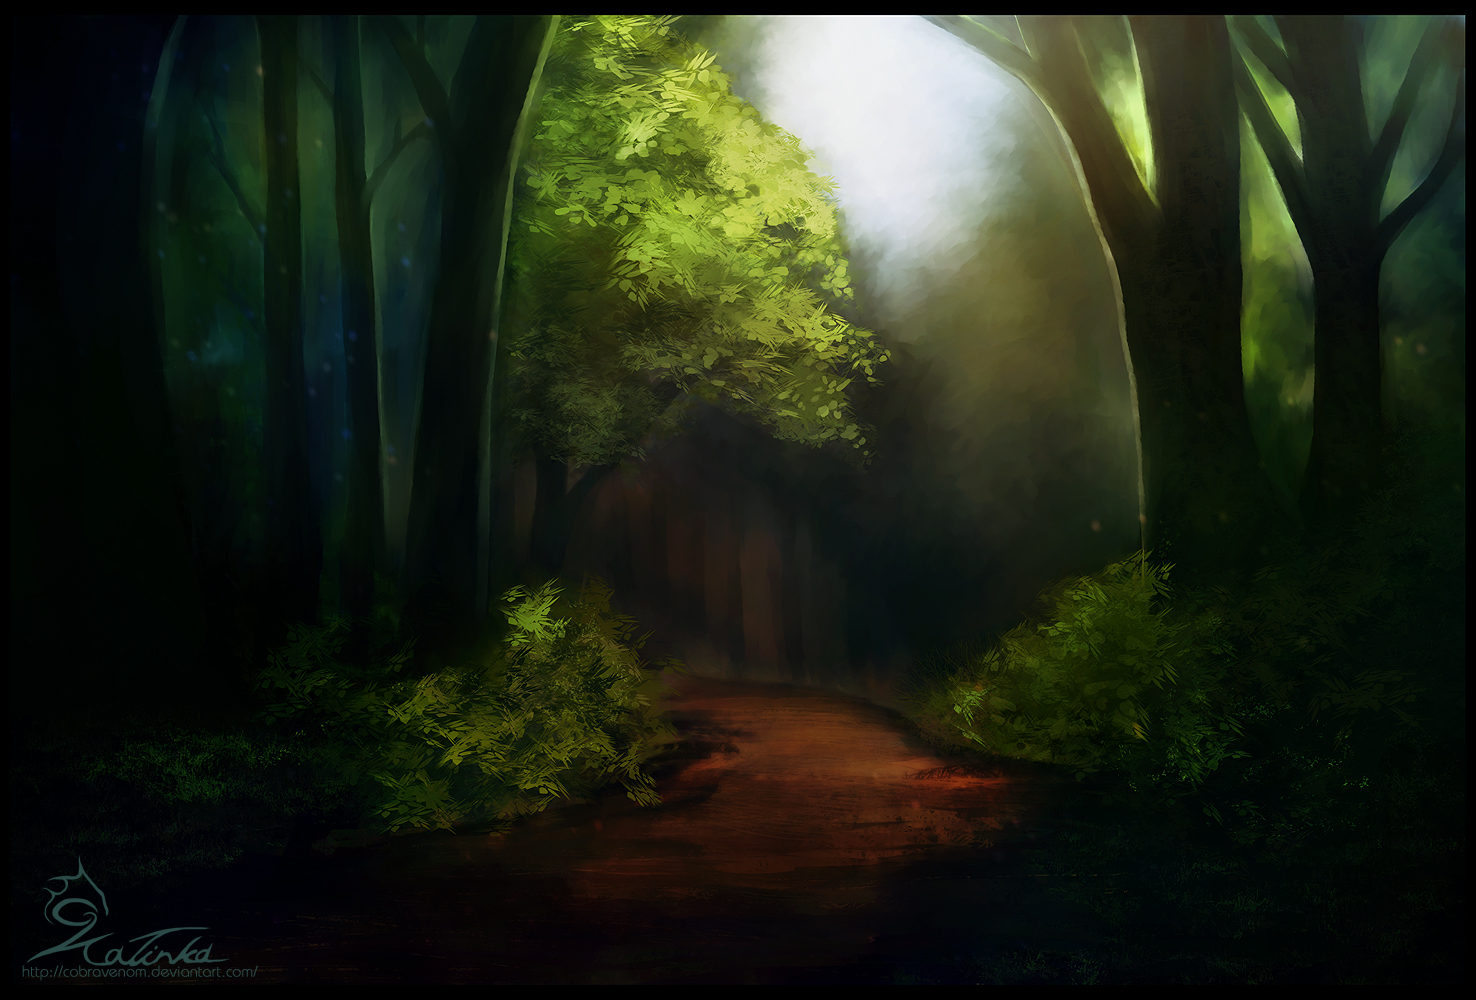 The Way Ahead by CobraVenom